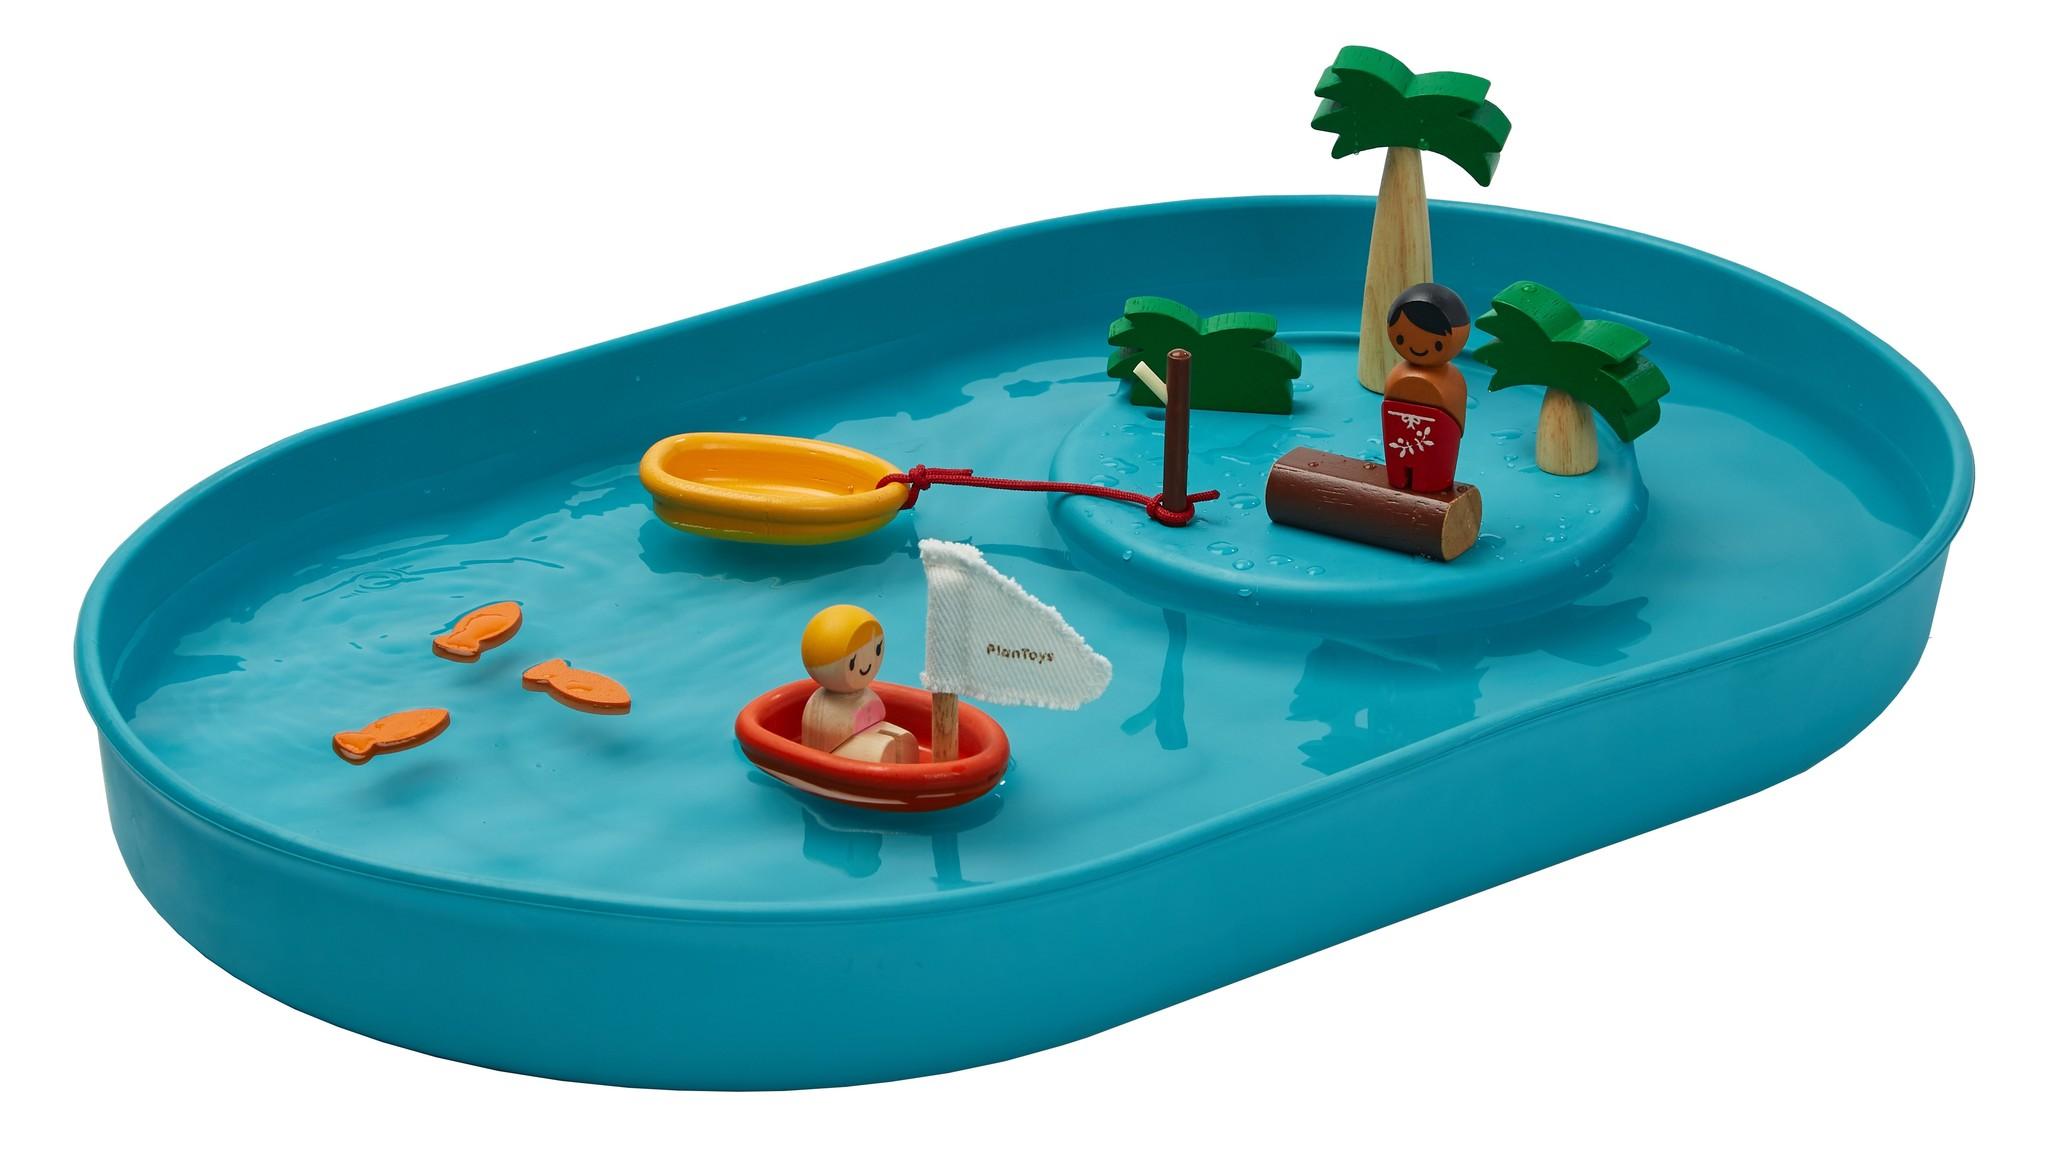 plan toys waterspeel set - Duurzame webshoptip // Lazy Lama